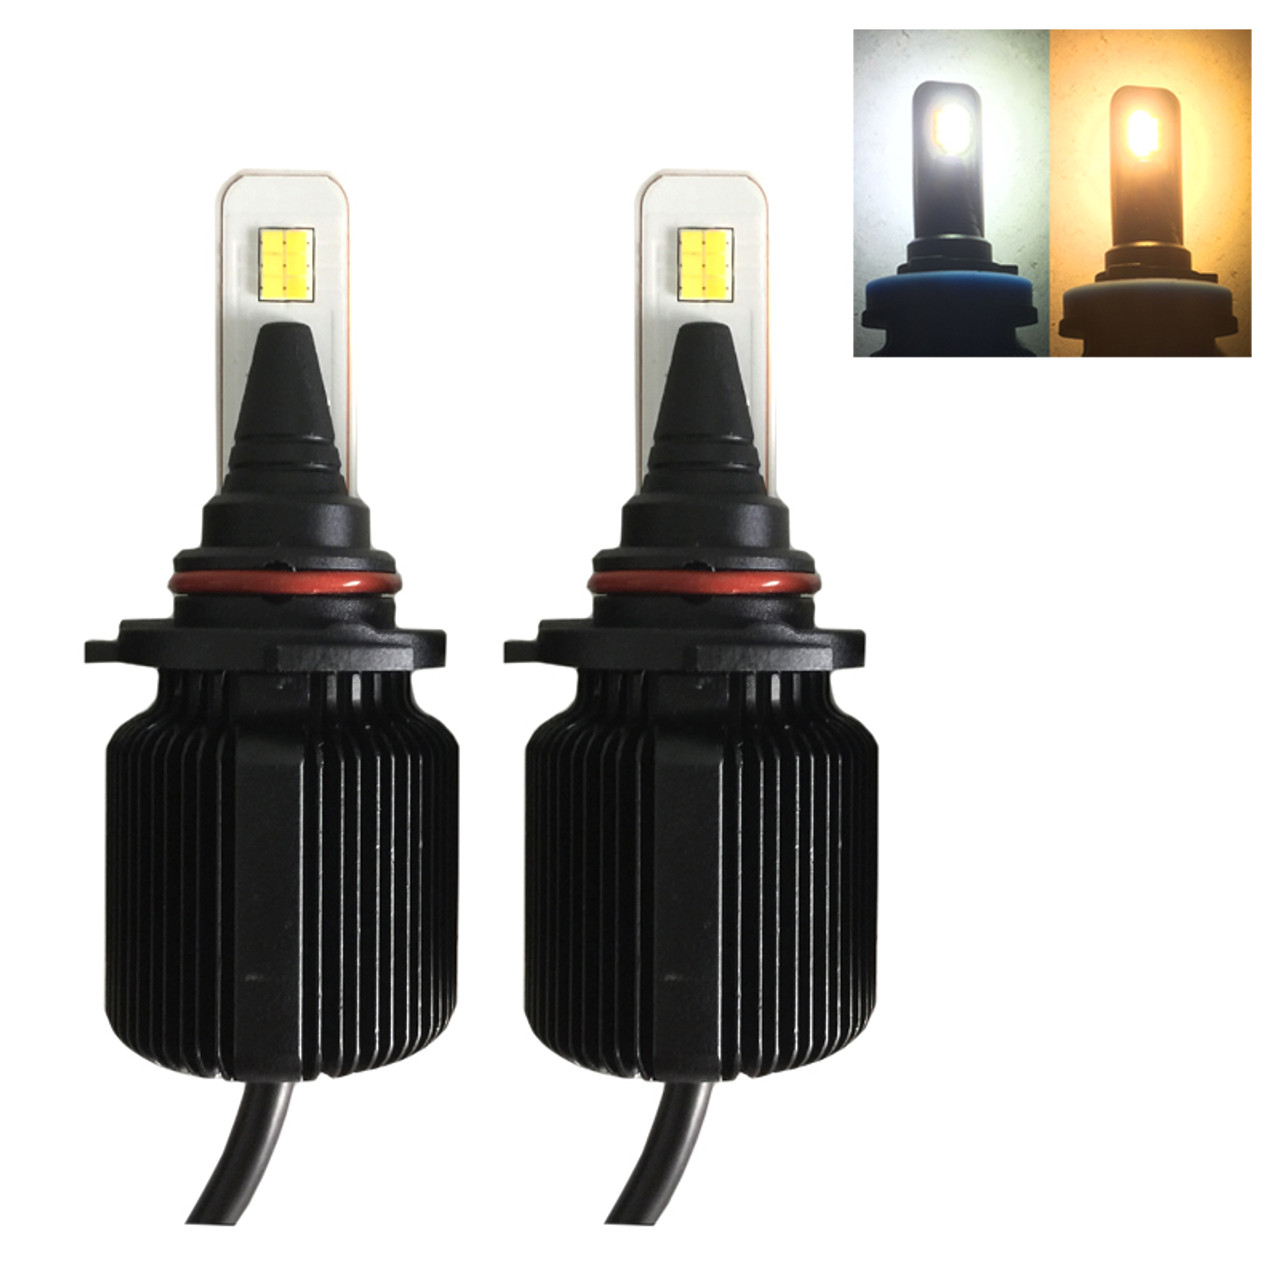 H10 (H12, 9005, 9140, 9145, 9155) M1D 8000lm 40W LED kit with DUAL COLOR  LED, fanless w/external LED driver - NEW!